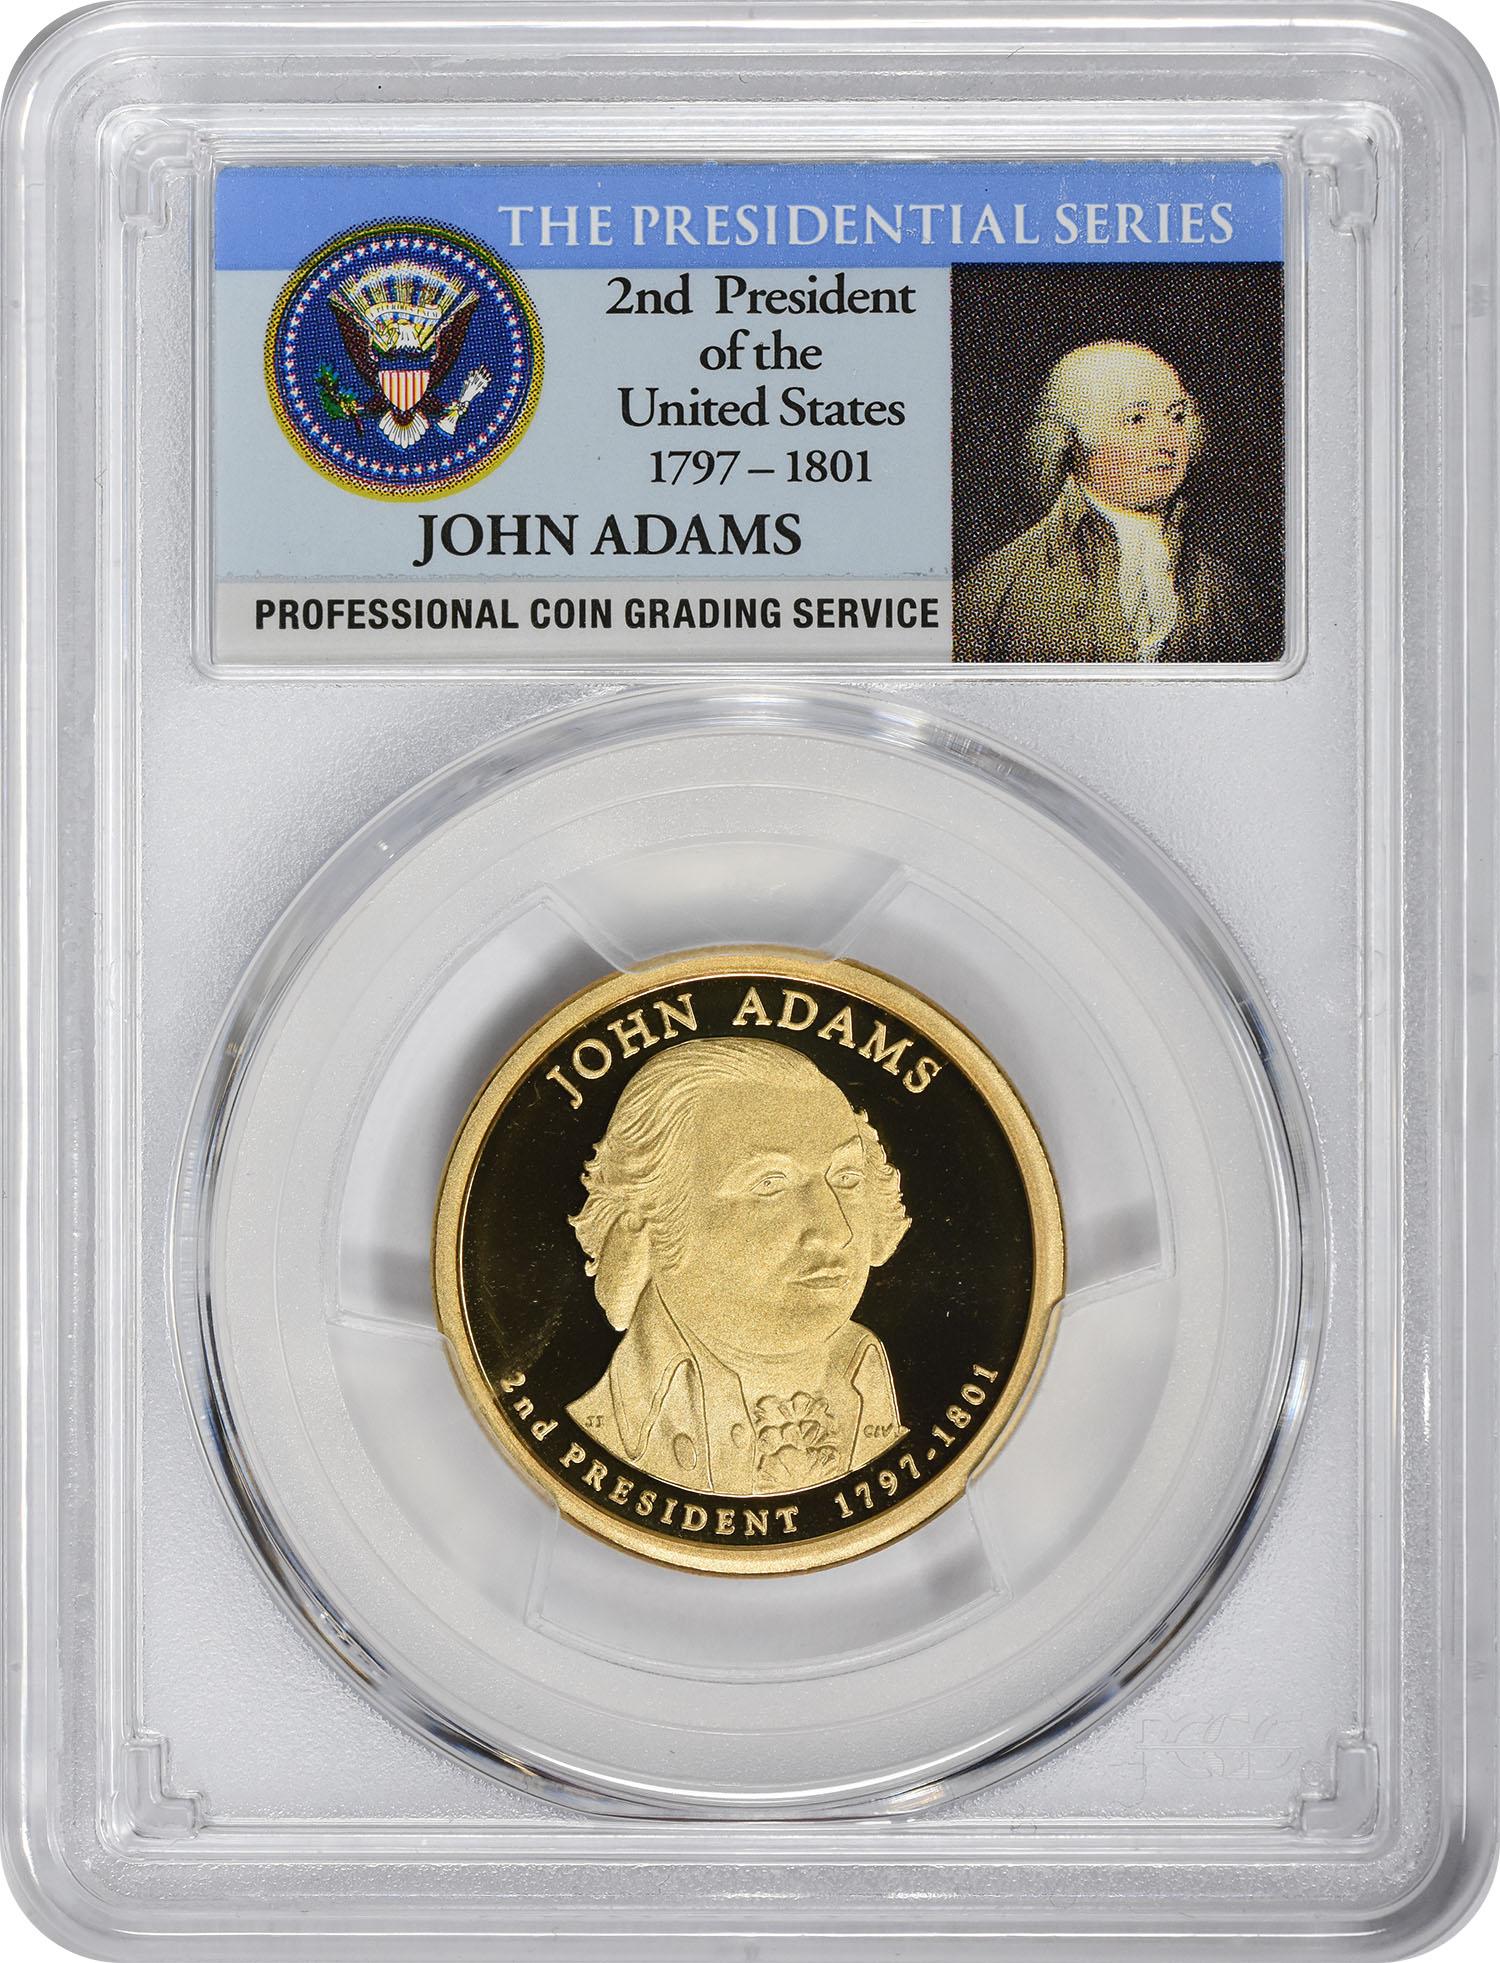 2007-S John Adams Presidential Dollar, PR69DCAM, PCGS